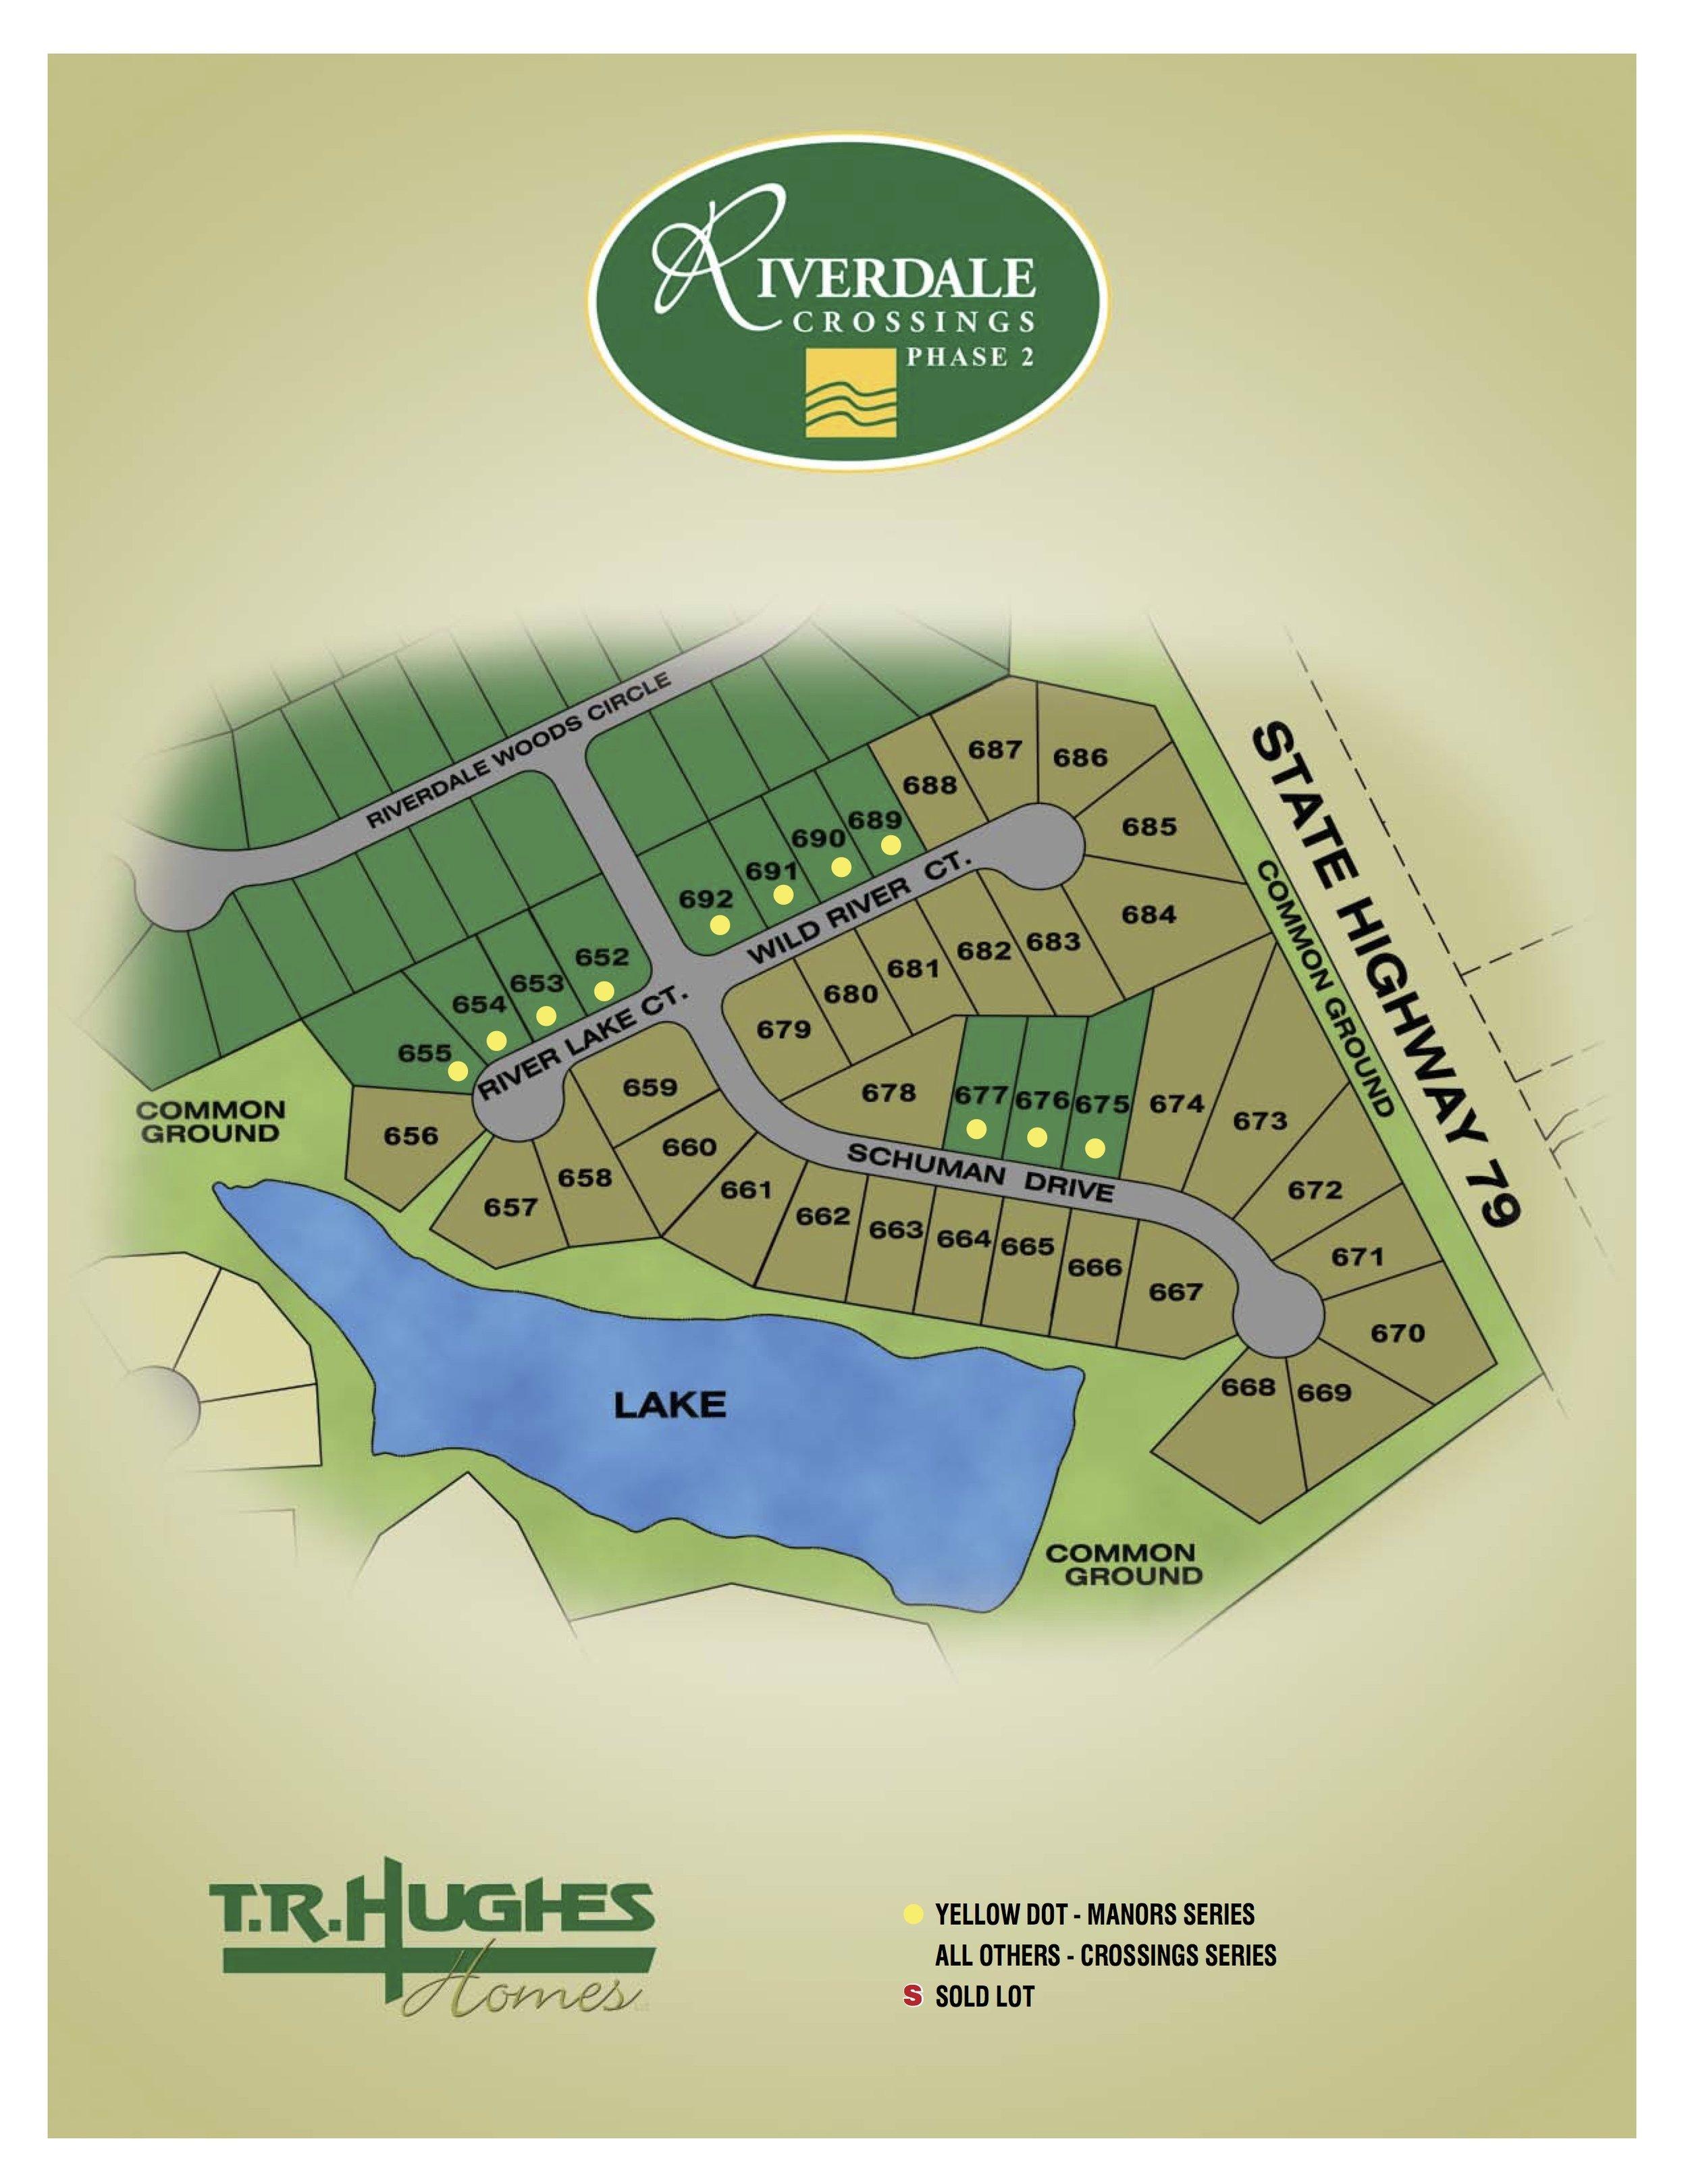 Saint Paul, MO Riverdale Crossings Phase 2 plat map